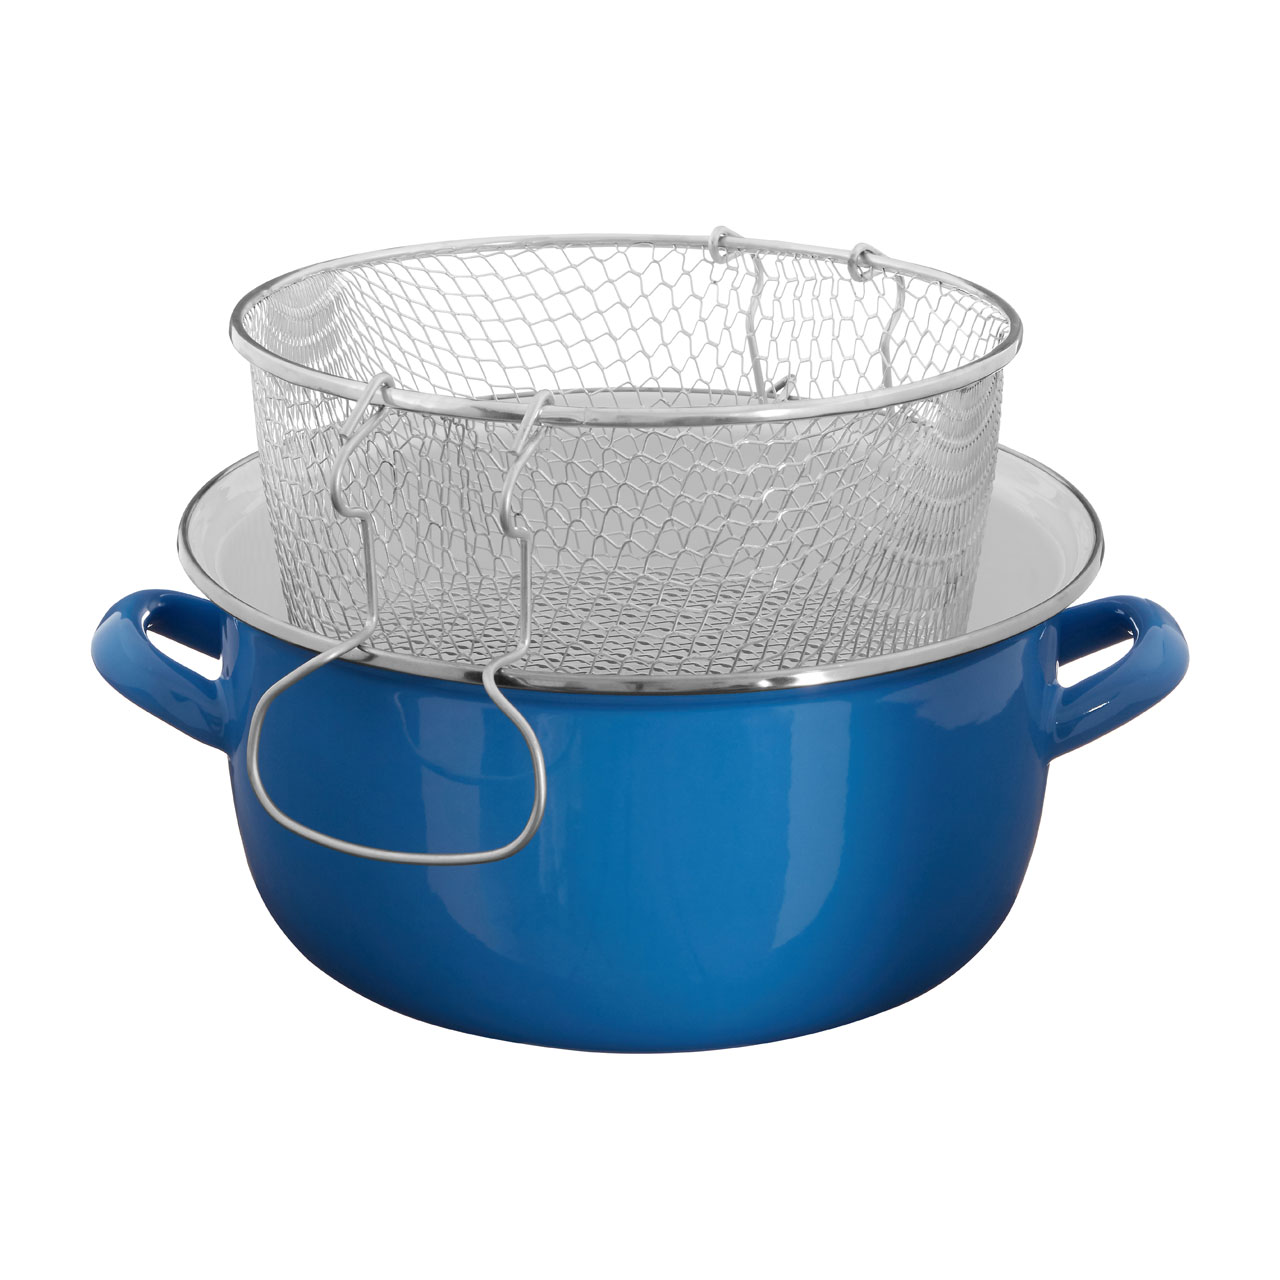 5 Litre Enamel Deep Fryer Pyrex Glass Lid Frying Fry Pan Cooking Pot ...